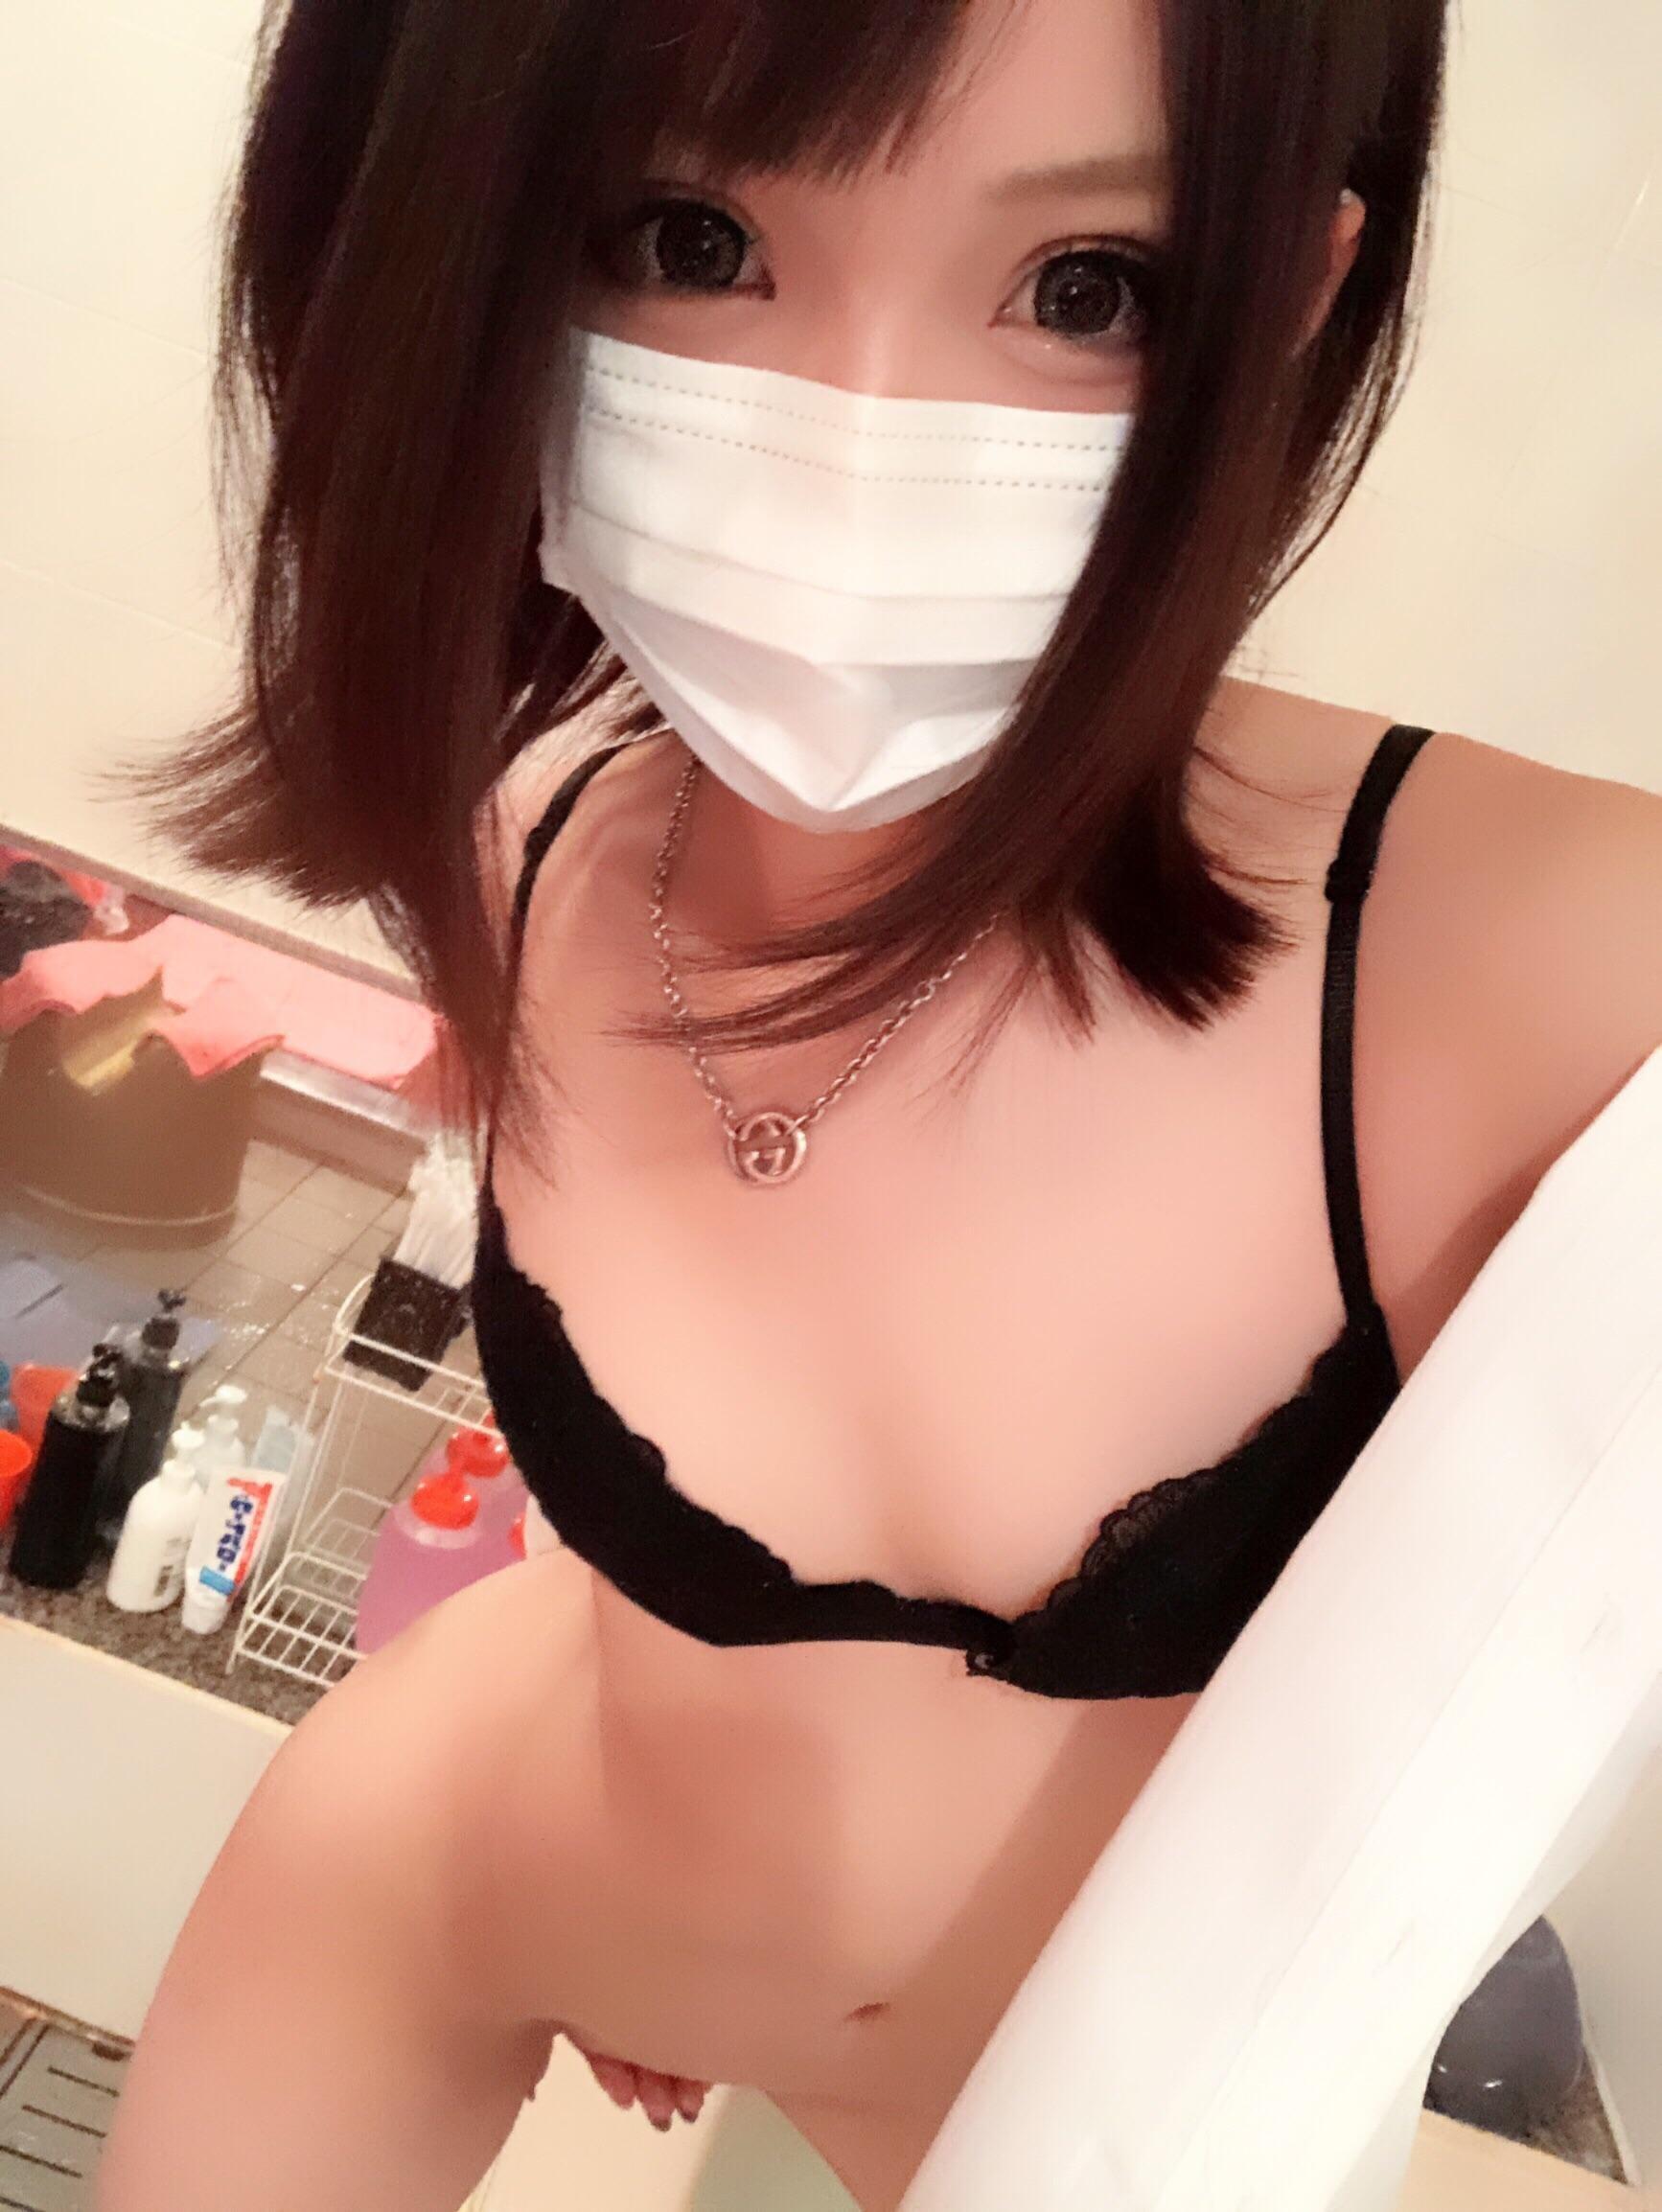 「????」09/22(09/22) 02:44 | Reiの写メ・風俗動画